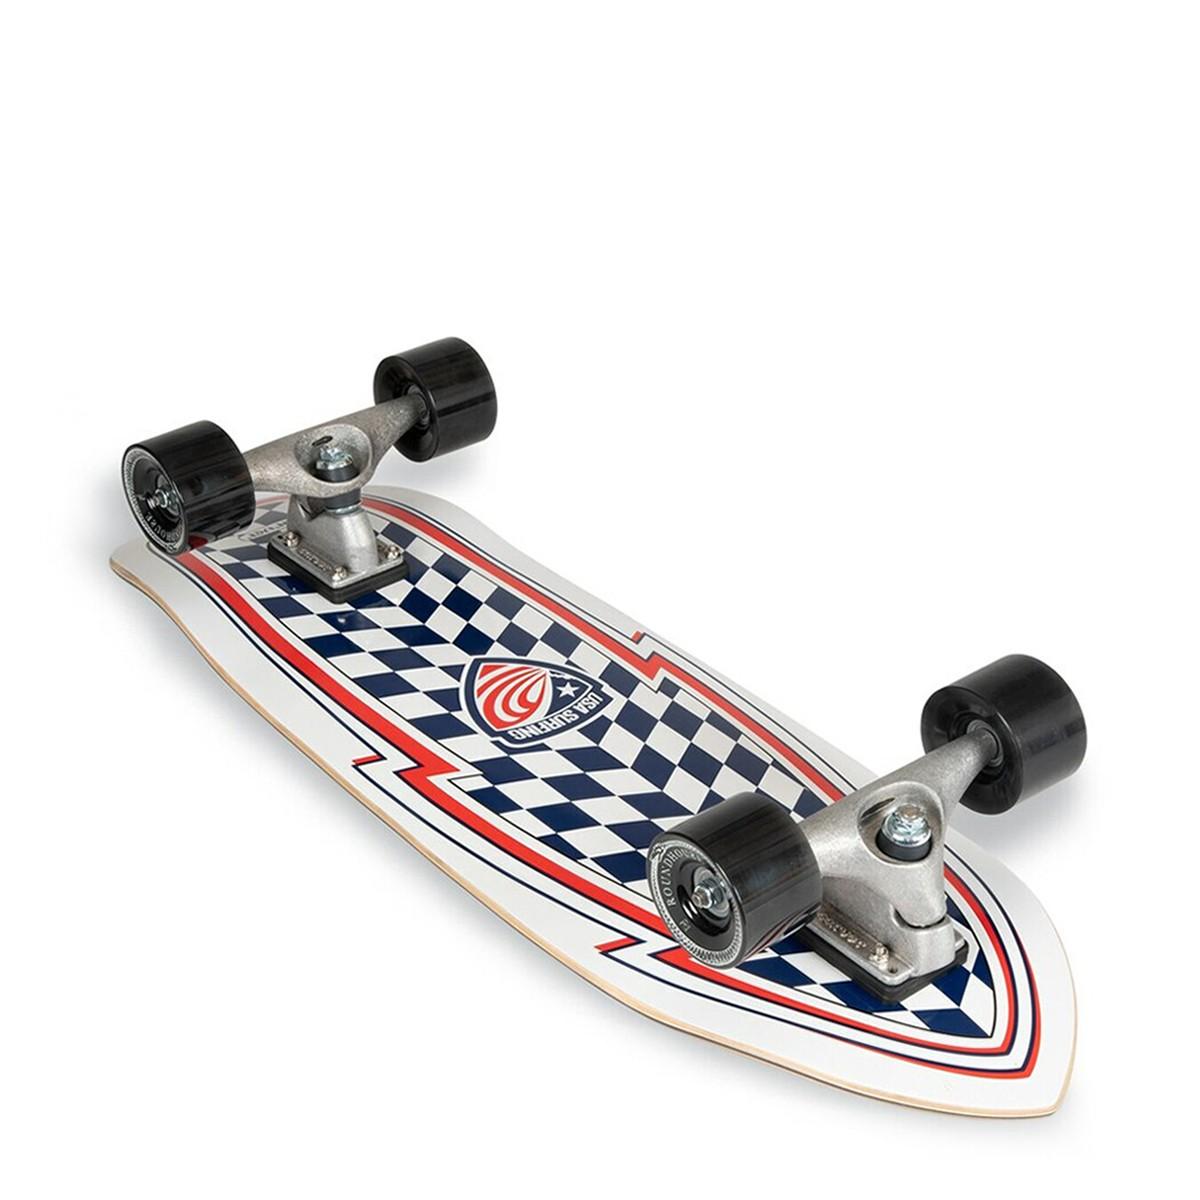 Carver USA Booster 30.75'' Surfskates CX Cruiser C1013011069